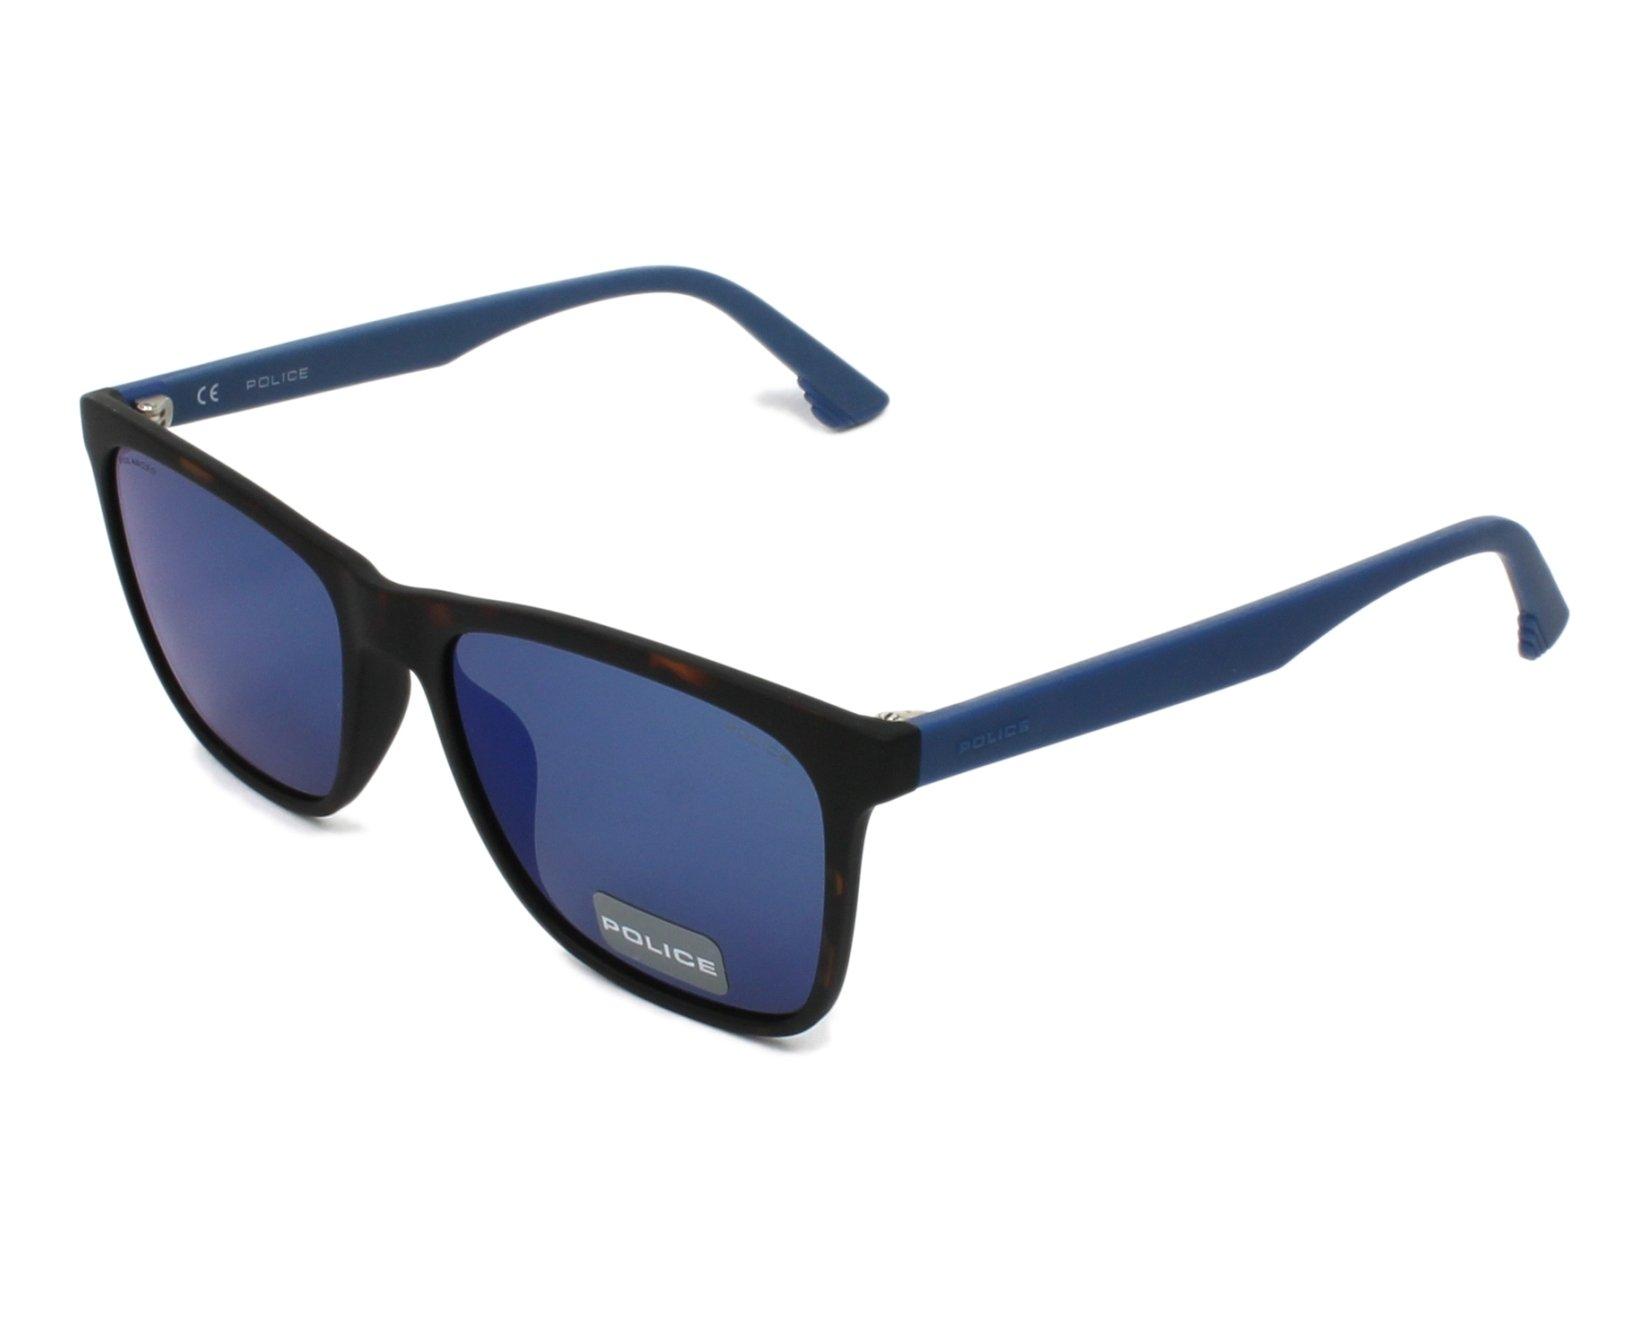 a4cd3c48bb Gafas de sol Police SPL-633 7VEP 55-17 Havana Azul vista de perfil